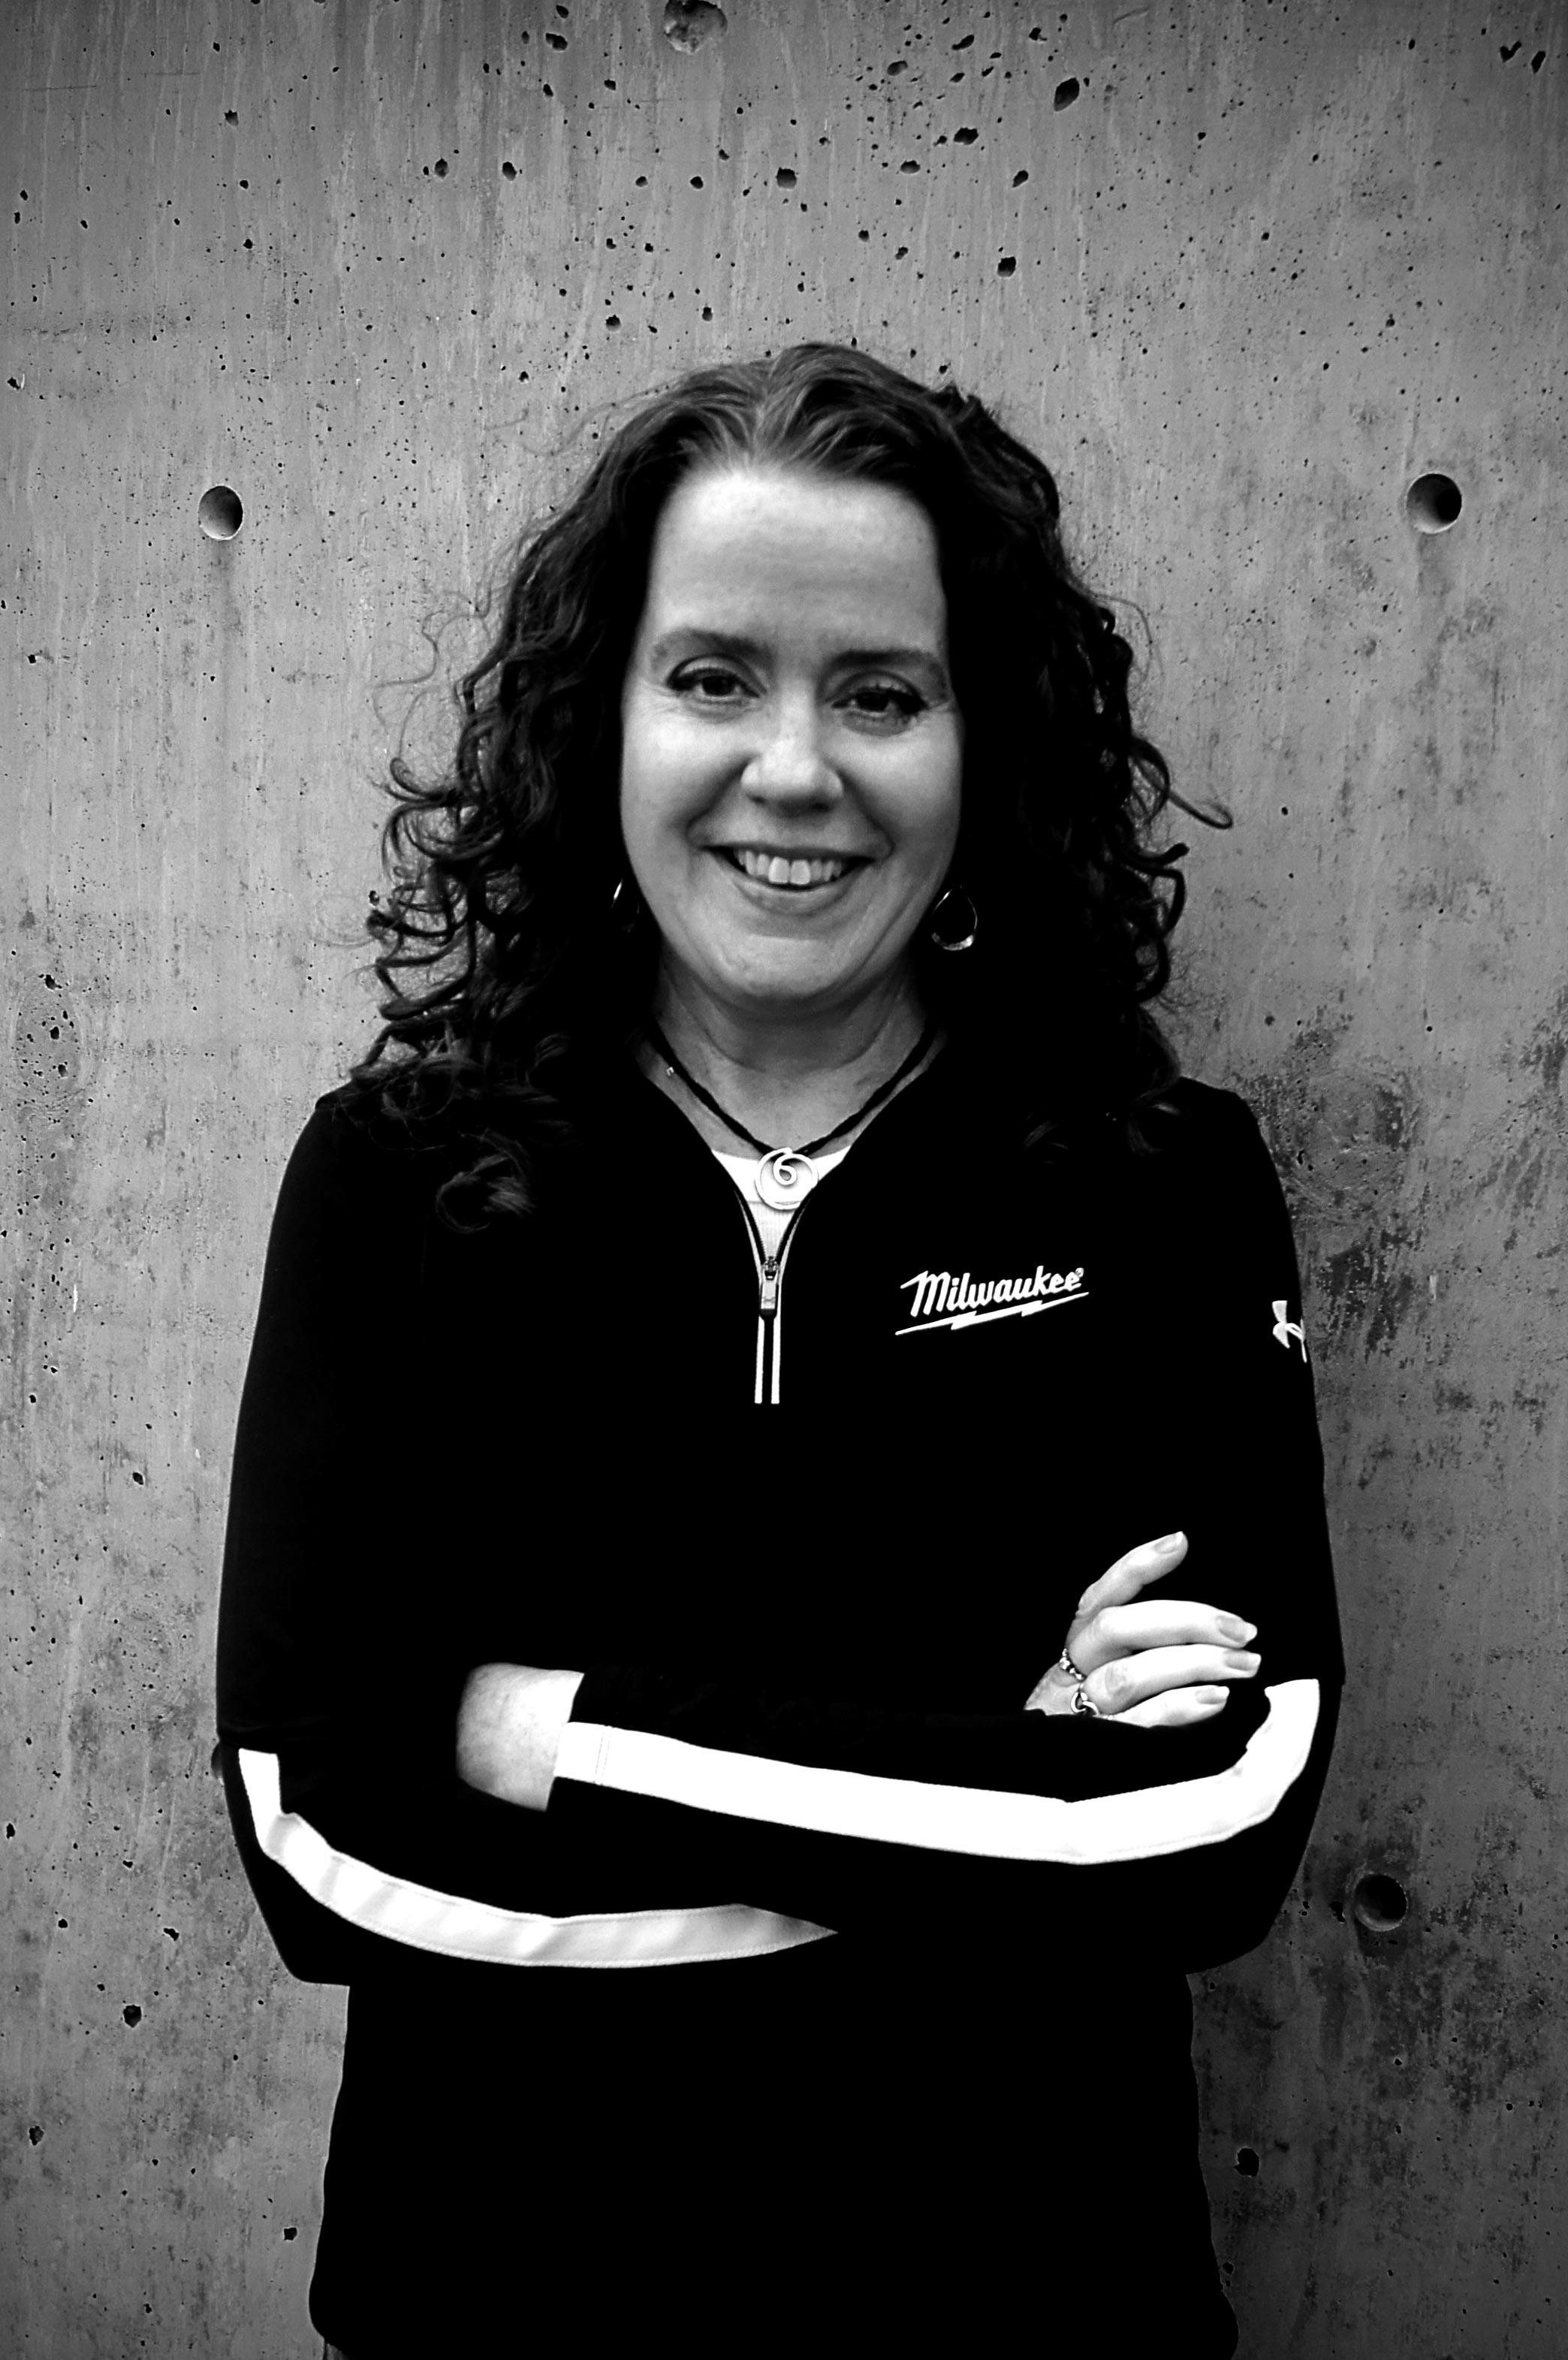 Lisa Martensen